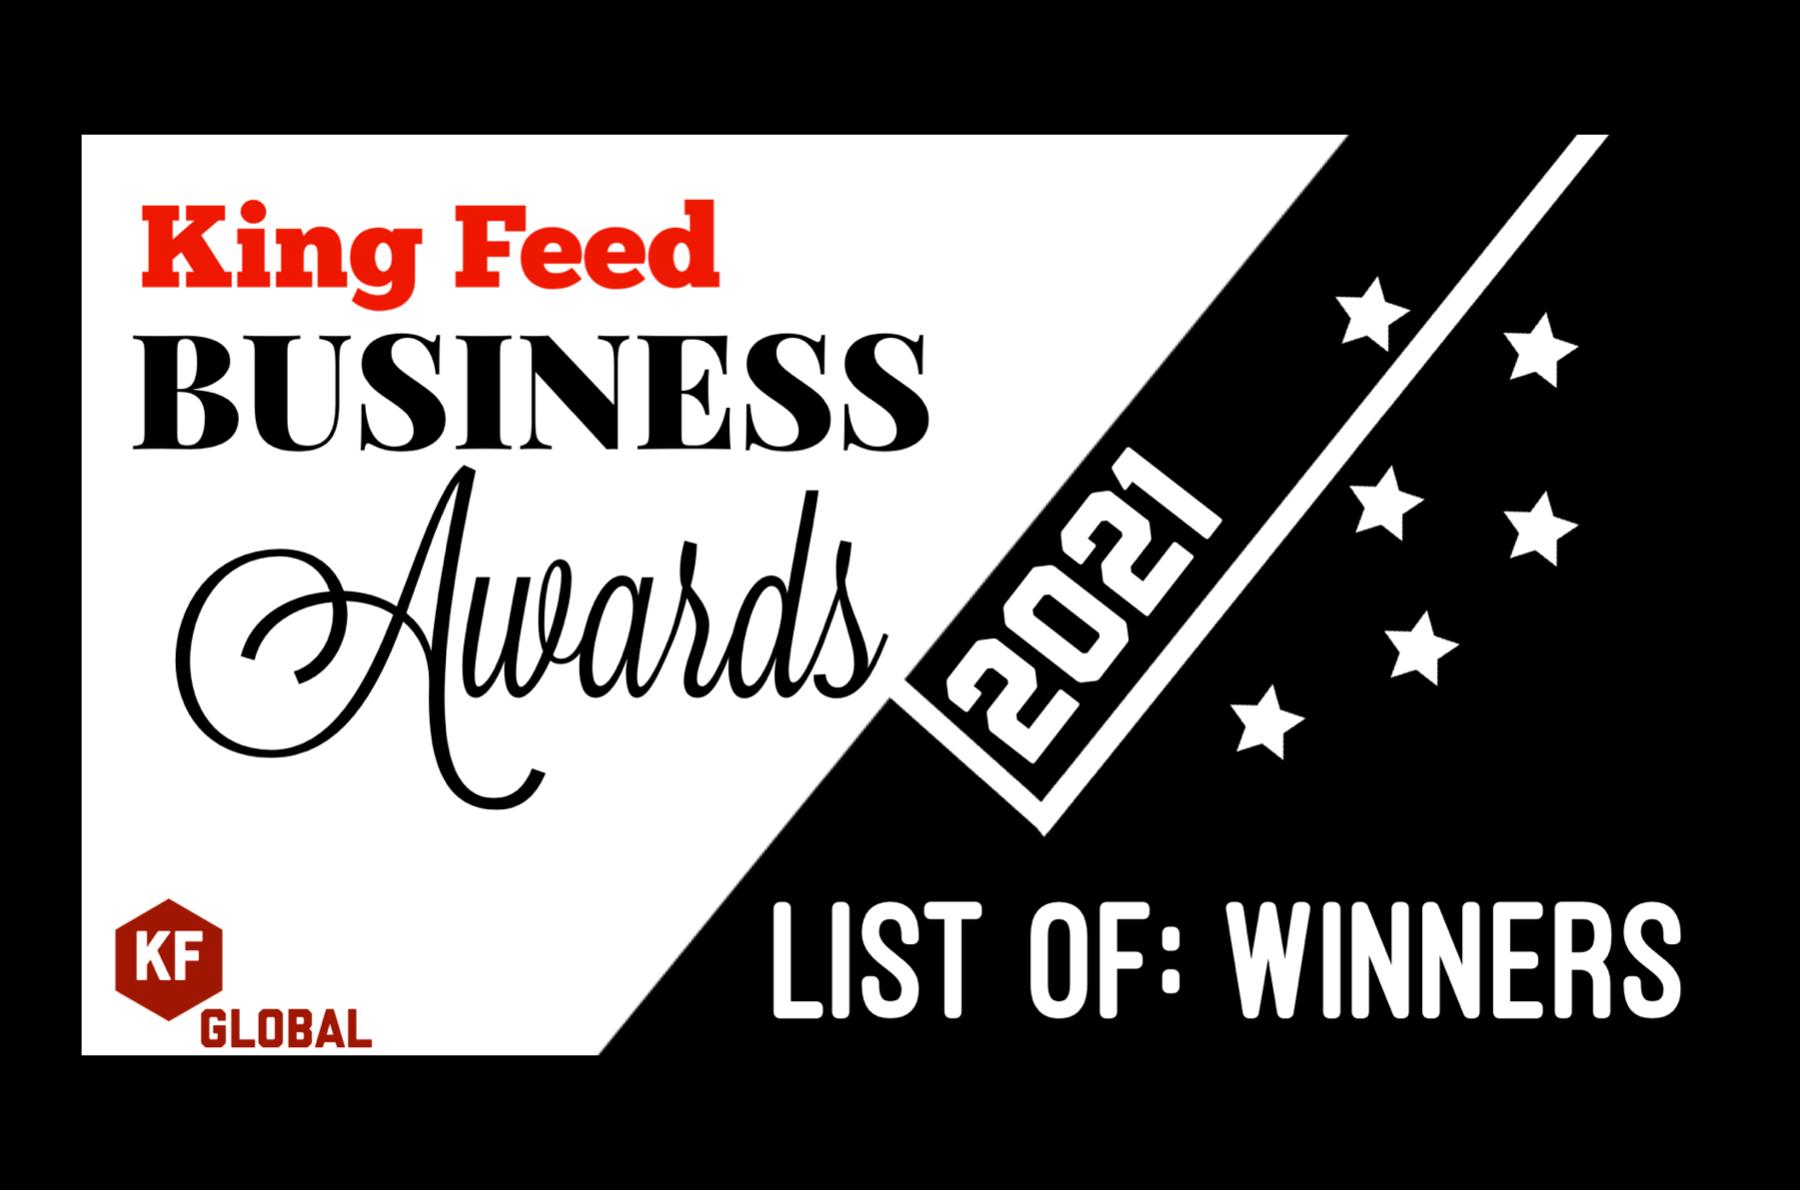 business awards theking feed king feed alex west shop alexwestshop redbubble teepublic spreadshirt